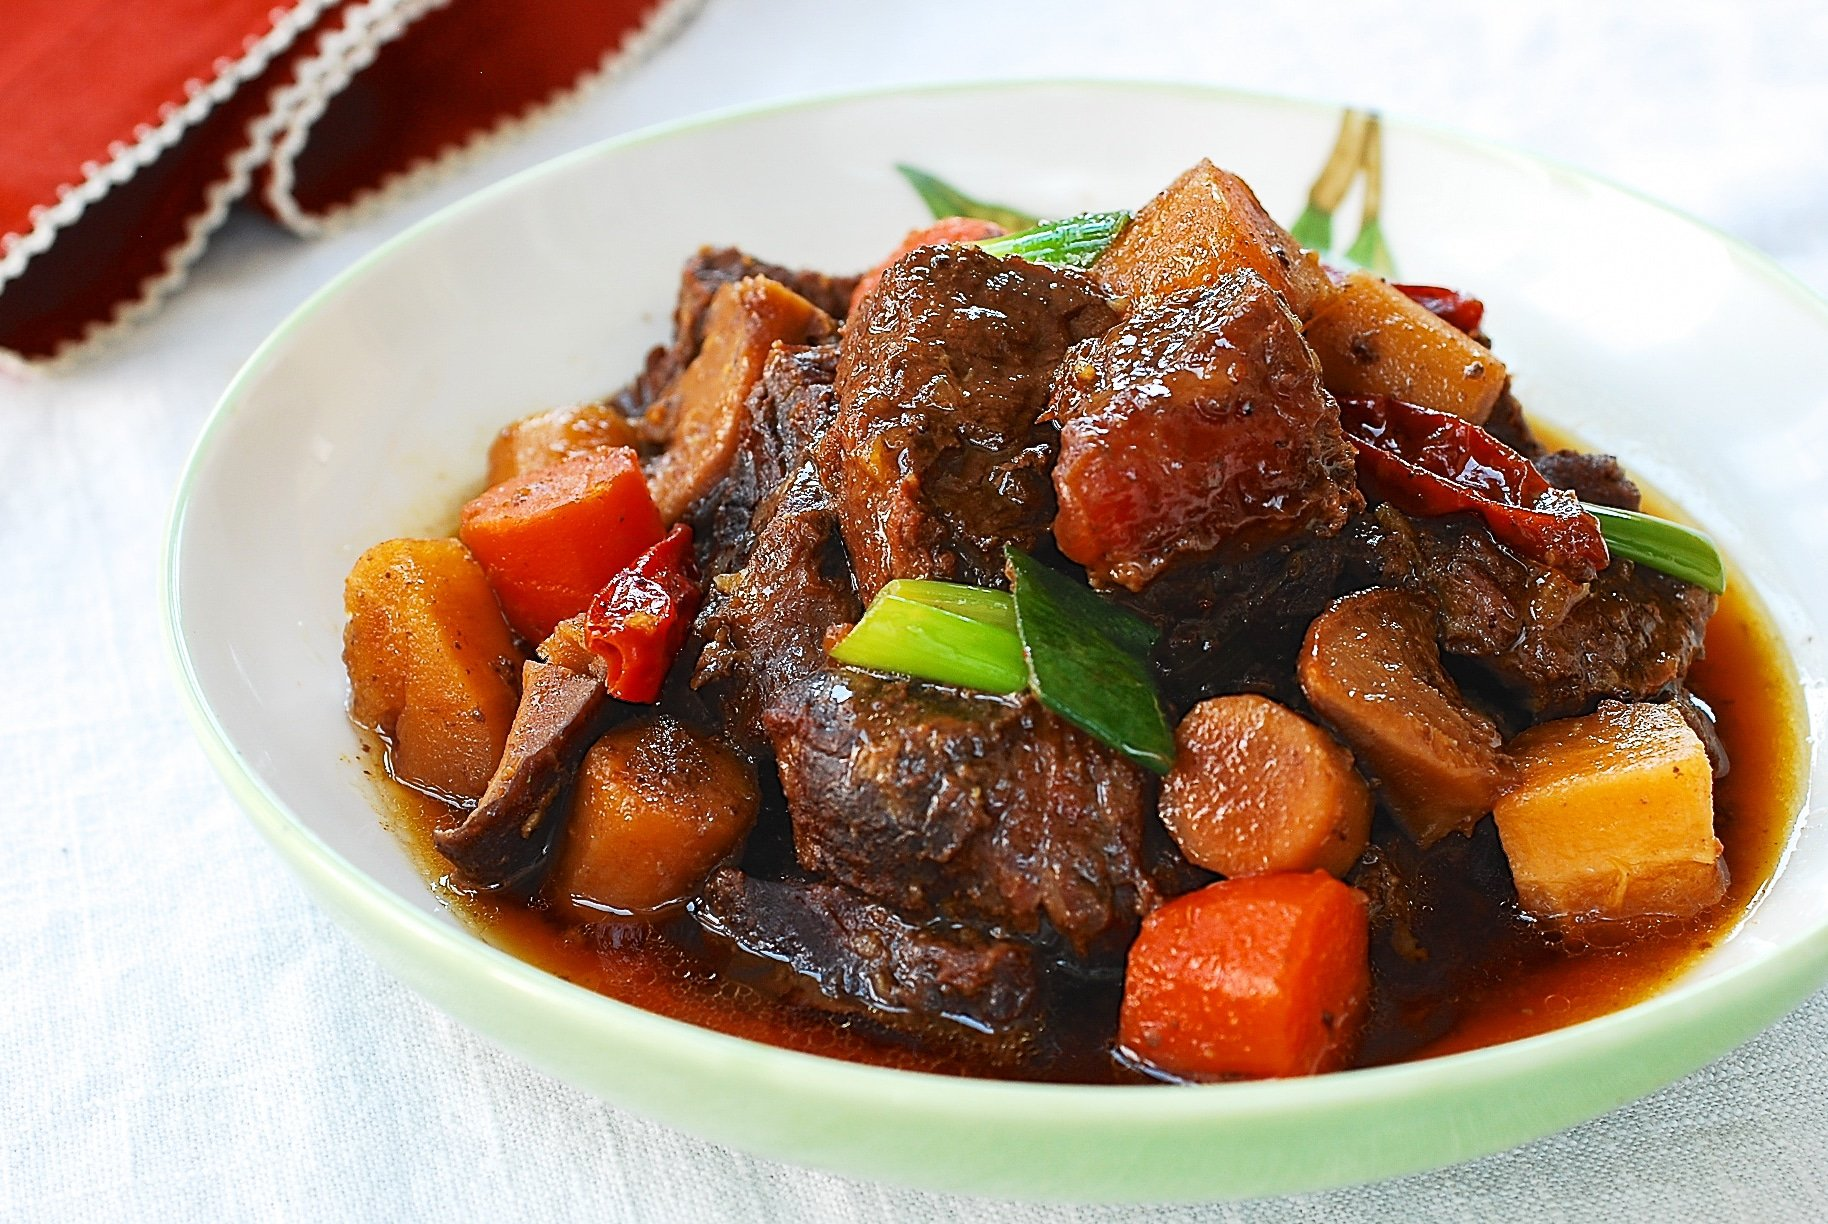 DSC 1067 1 - Sataejjim (Slow Cooker Braised Beef Shank)